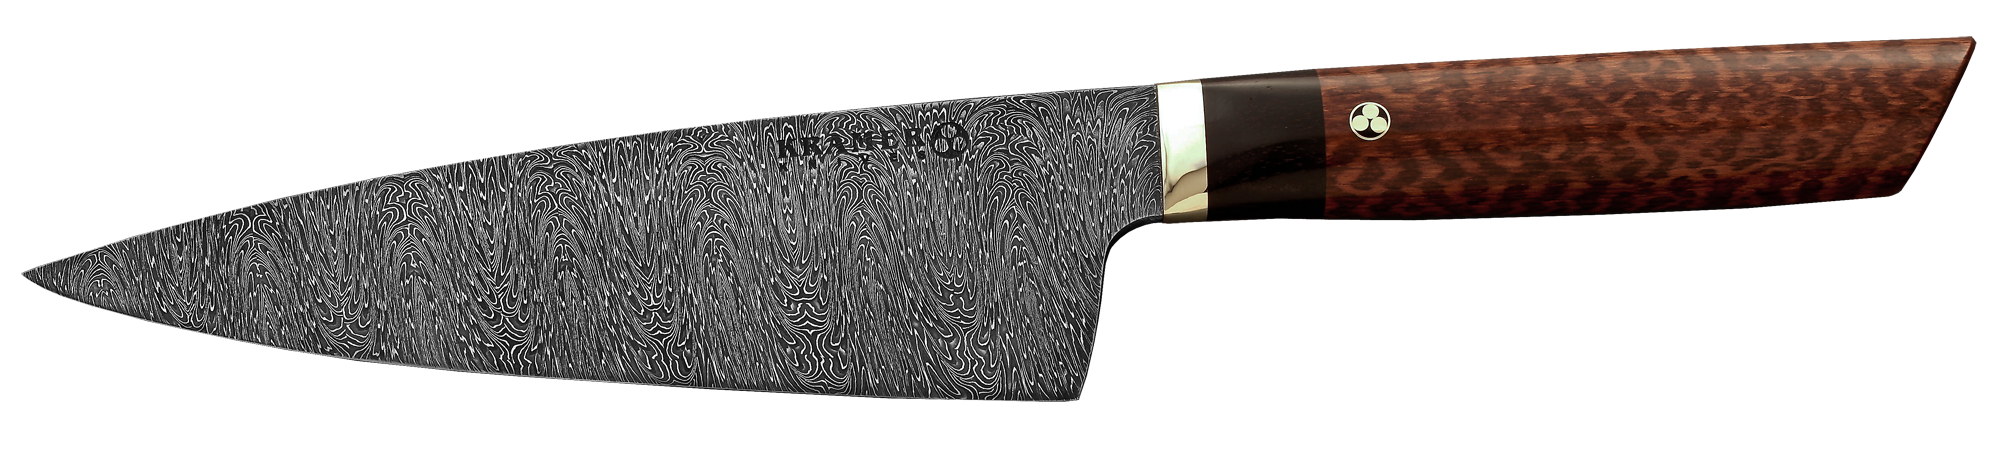 "8"" Chef (Meiji Style - RH) Milky Wave Mosaic Damascus, Snakewood Handle"